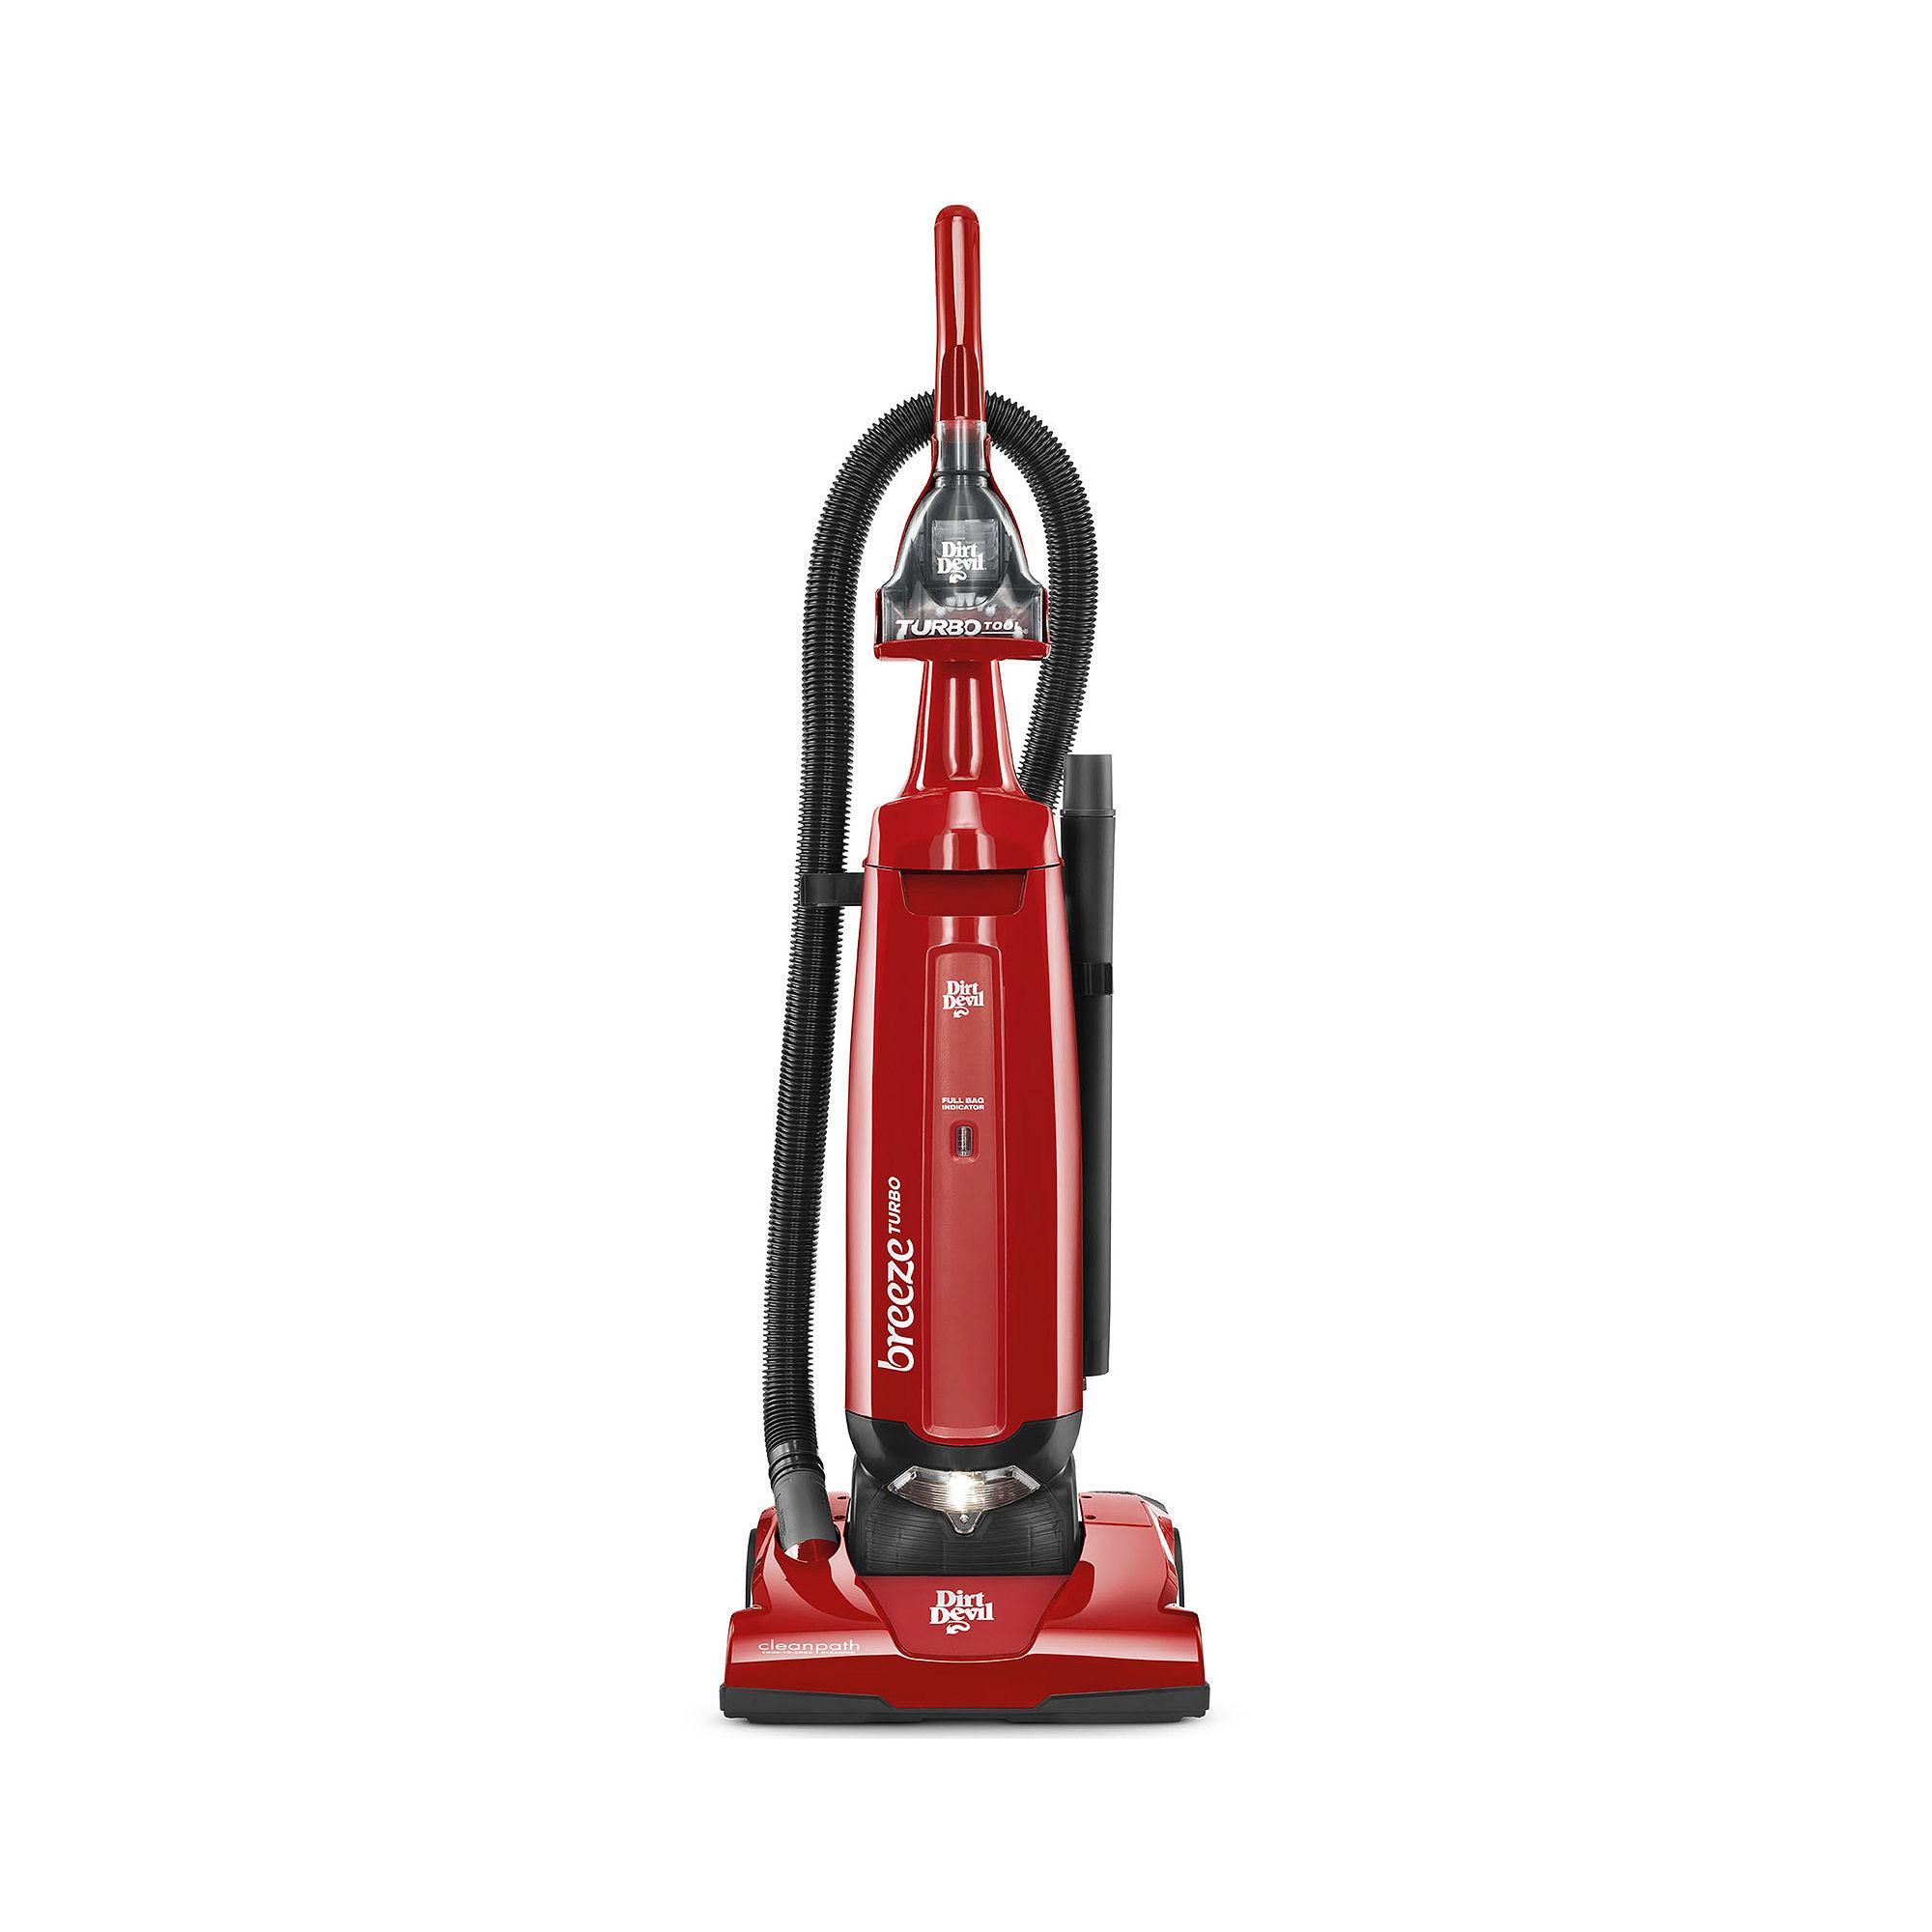 Vacuum Cleaner Dirt Devil Vision Turbo Bageless Upright